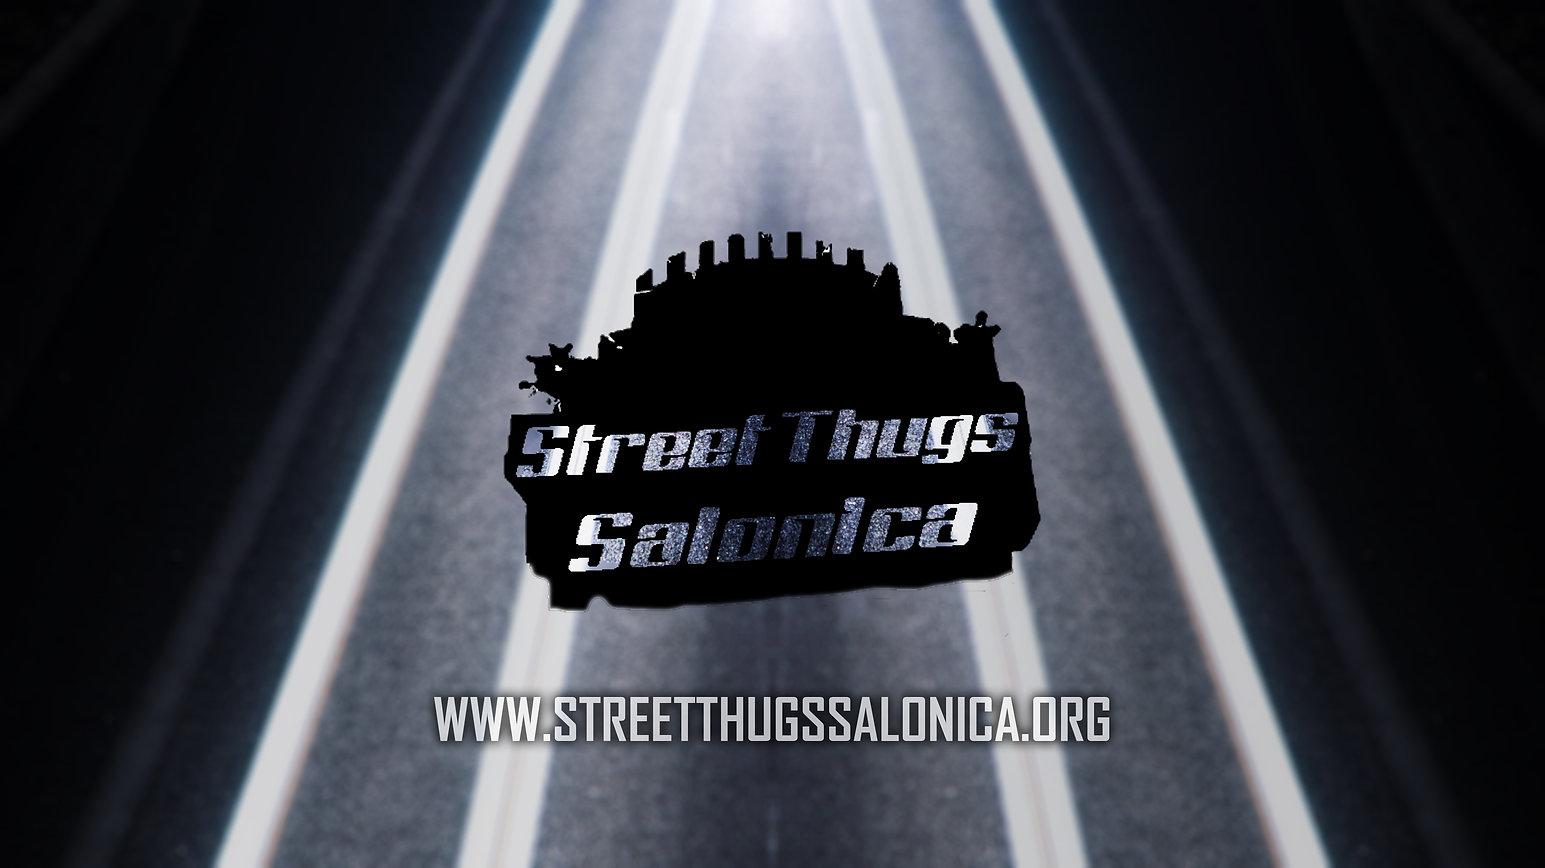 street thu logo backgrounds salonca